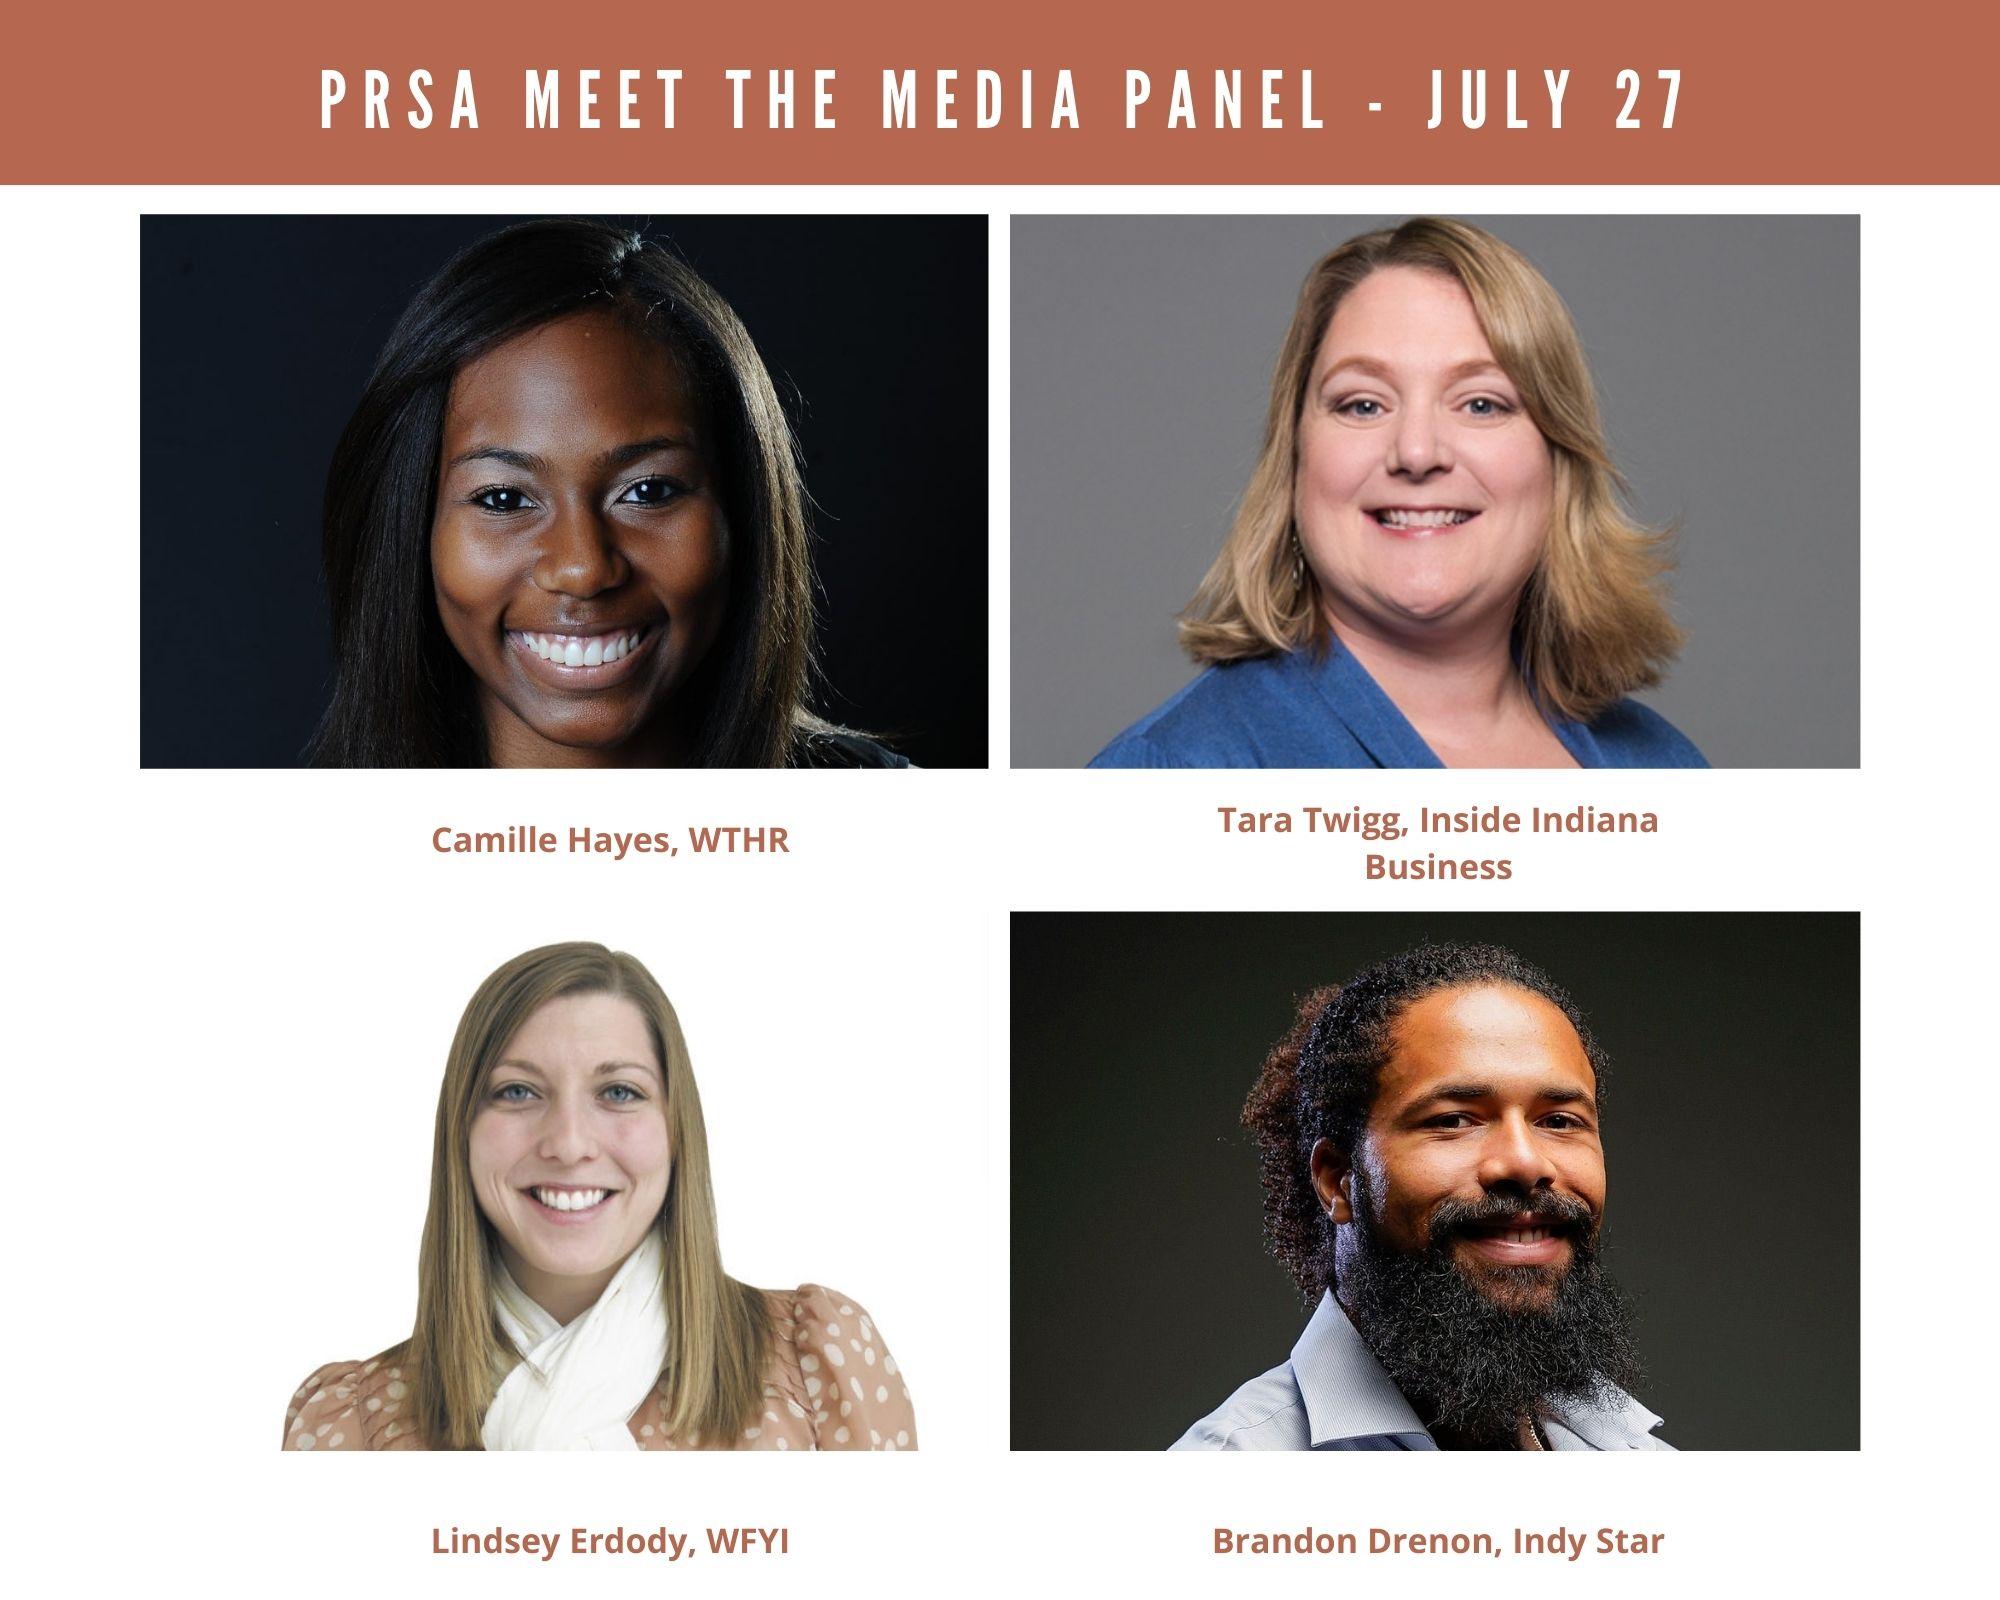 Image of Meet the Media panelists